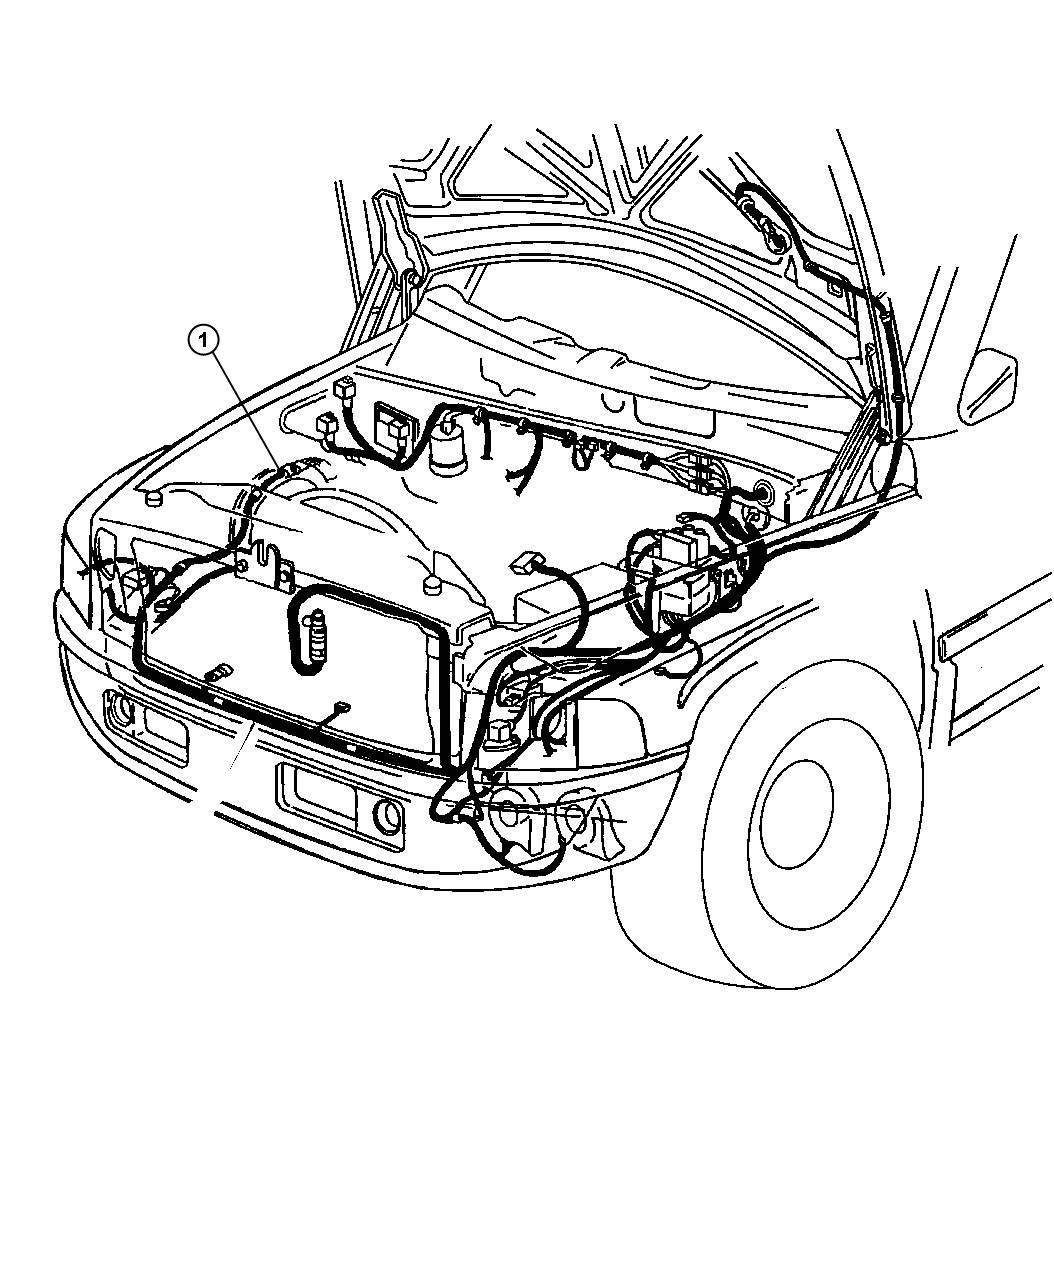 2006 Dodge Ram 2500 Wiring. Headlamp to dash. [brt